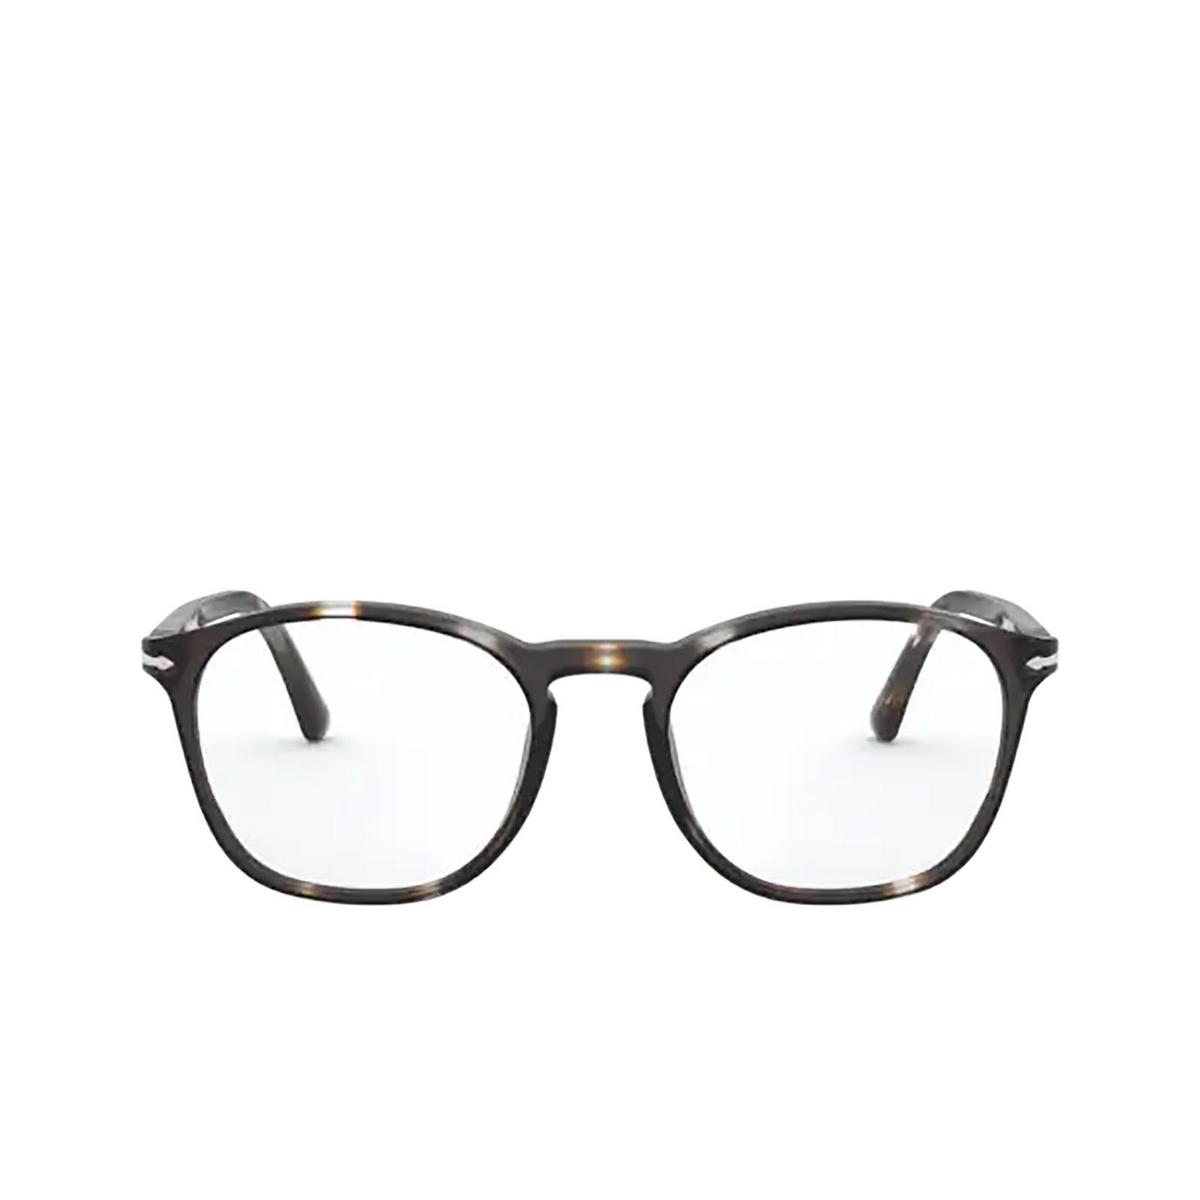 Persol® Square Eyeglasses: PO3007VM color Striped Brown & Smoke 1124 - front view.